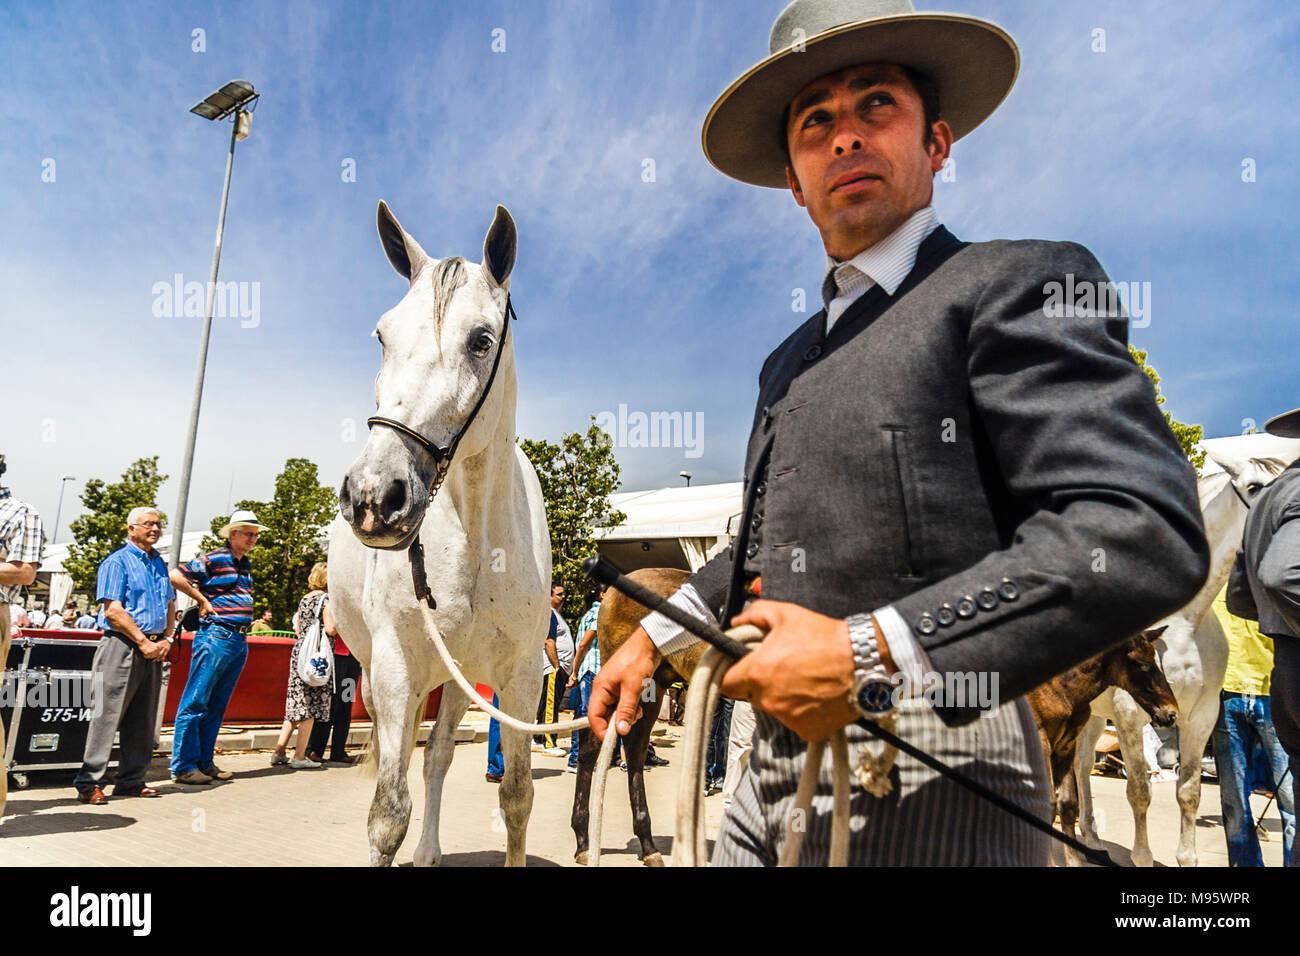 Córdoba, Andalucía, España : jinete andaluz y thoroughbred mare en la Feria del Caballo de Córdoba. Foto de stock